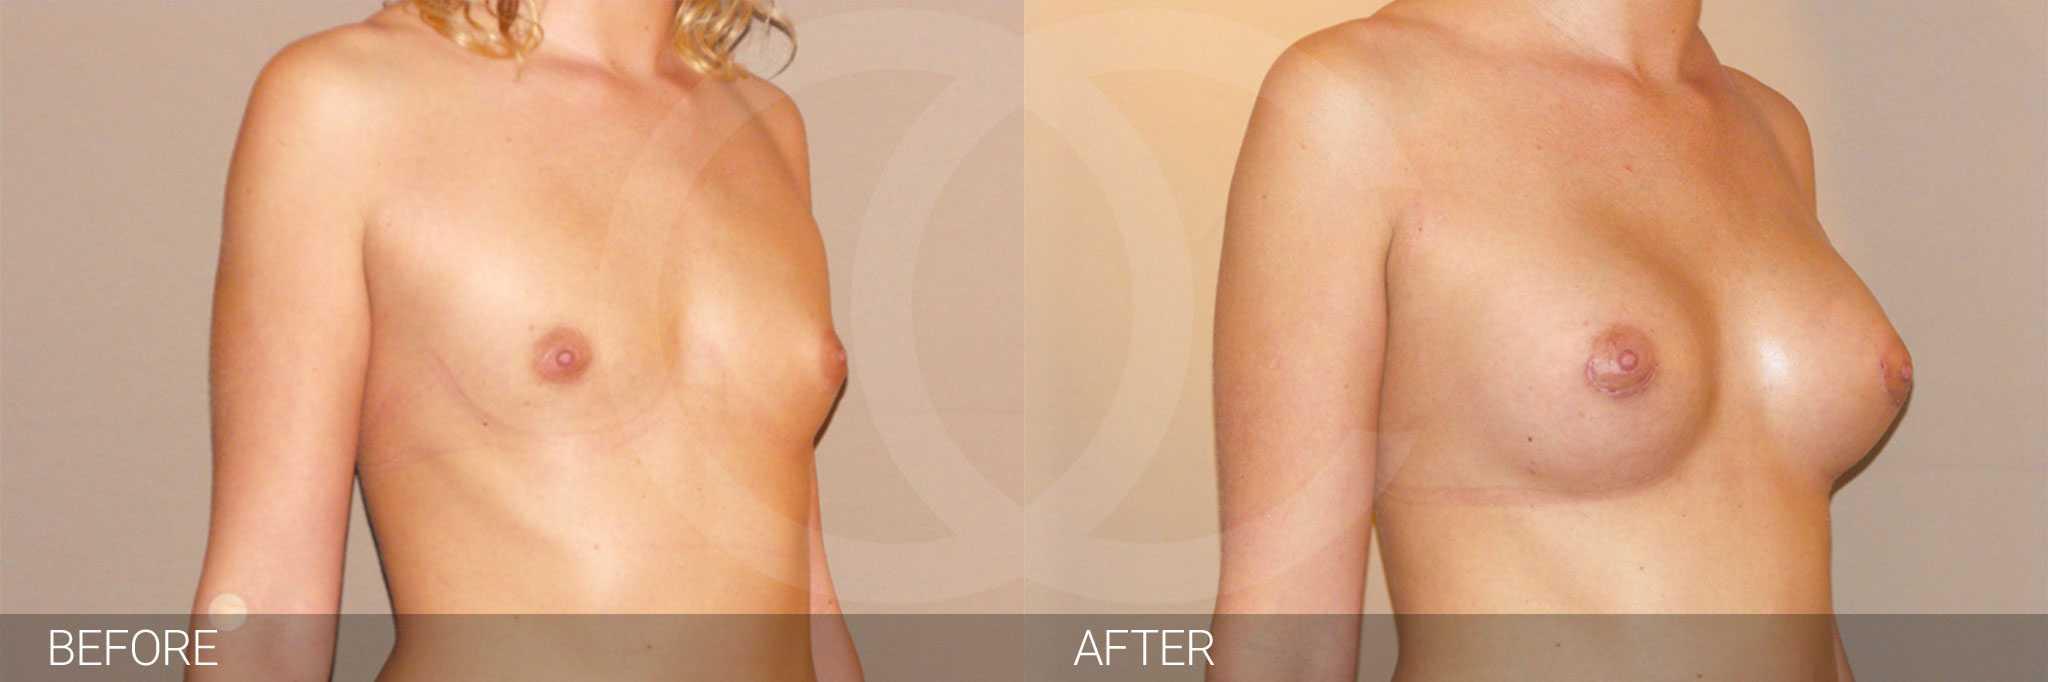 Augmentation mammaire Prothèse en silicone ante/post-op II